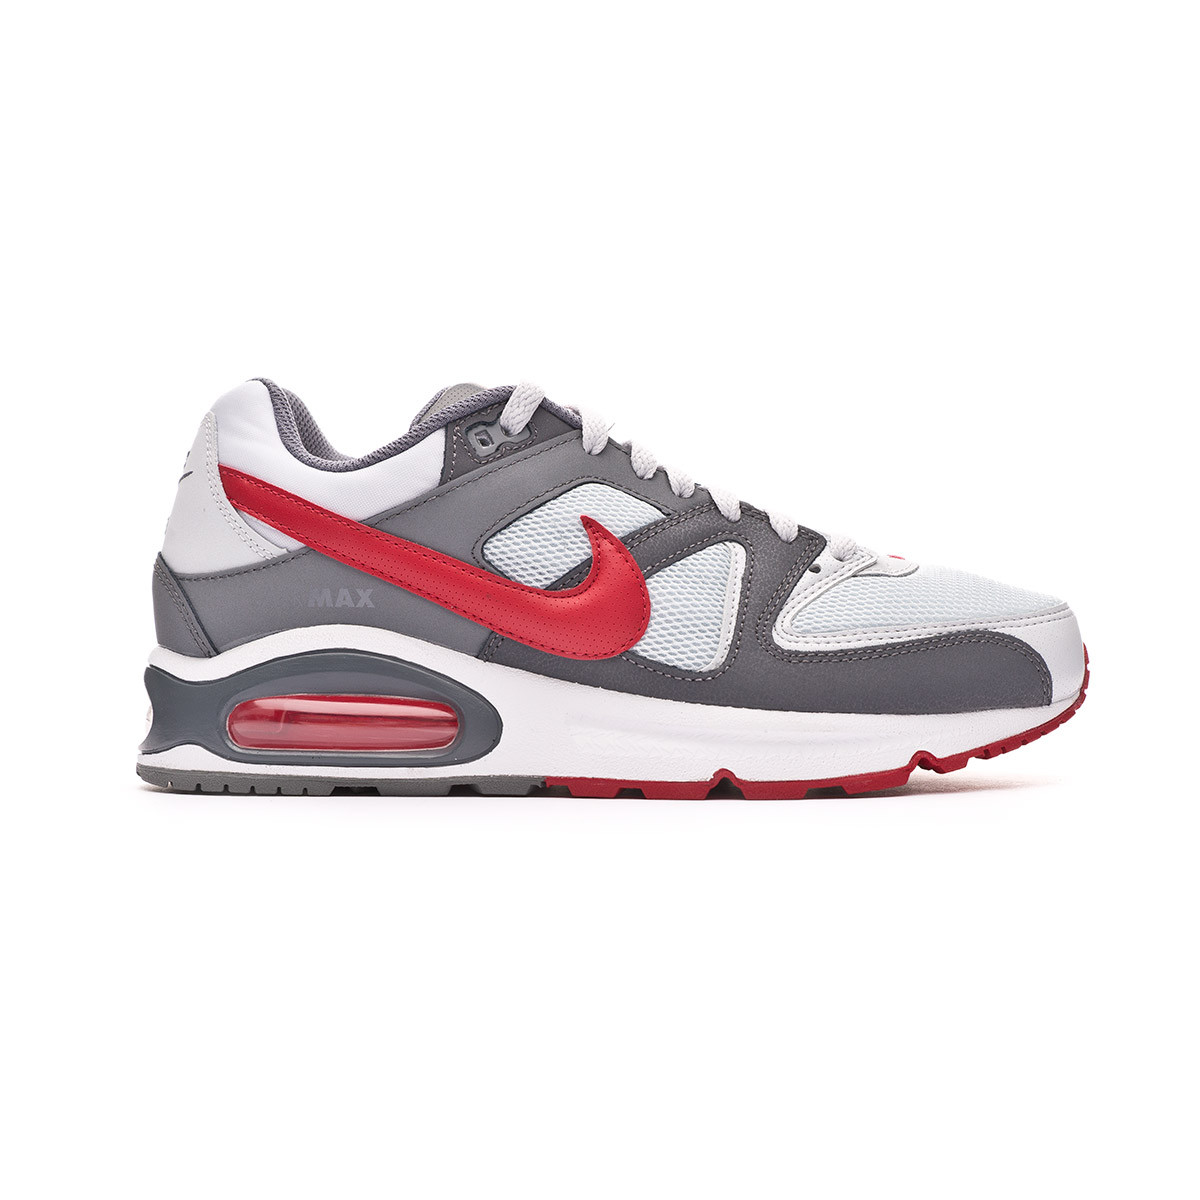 Zapatilla Air Max Command Shoe Pure platinum Gym red Dark grey